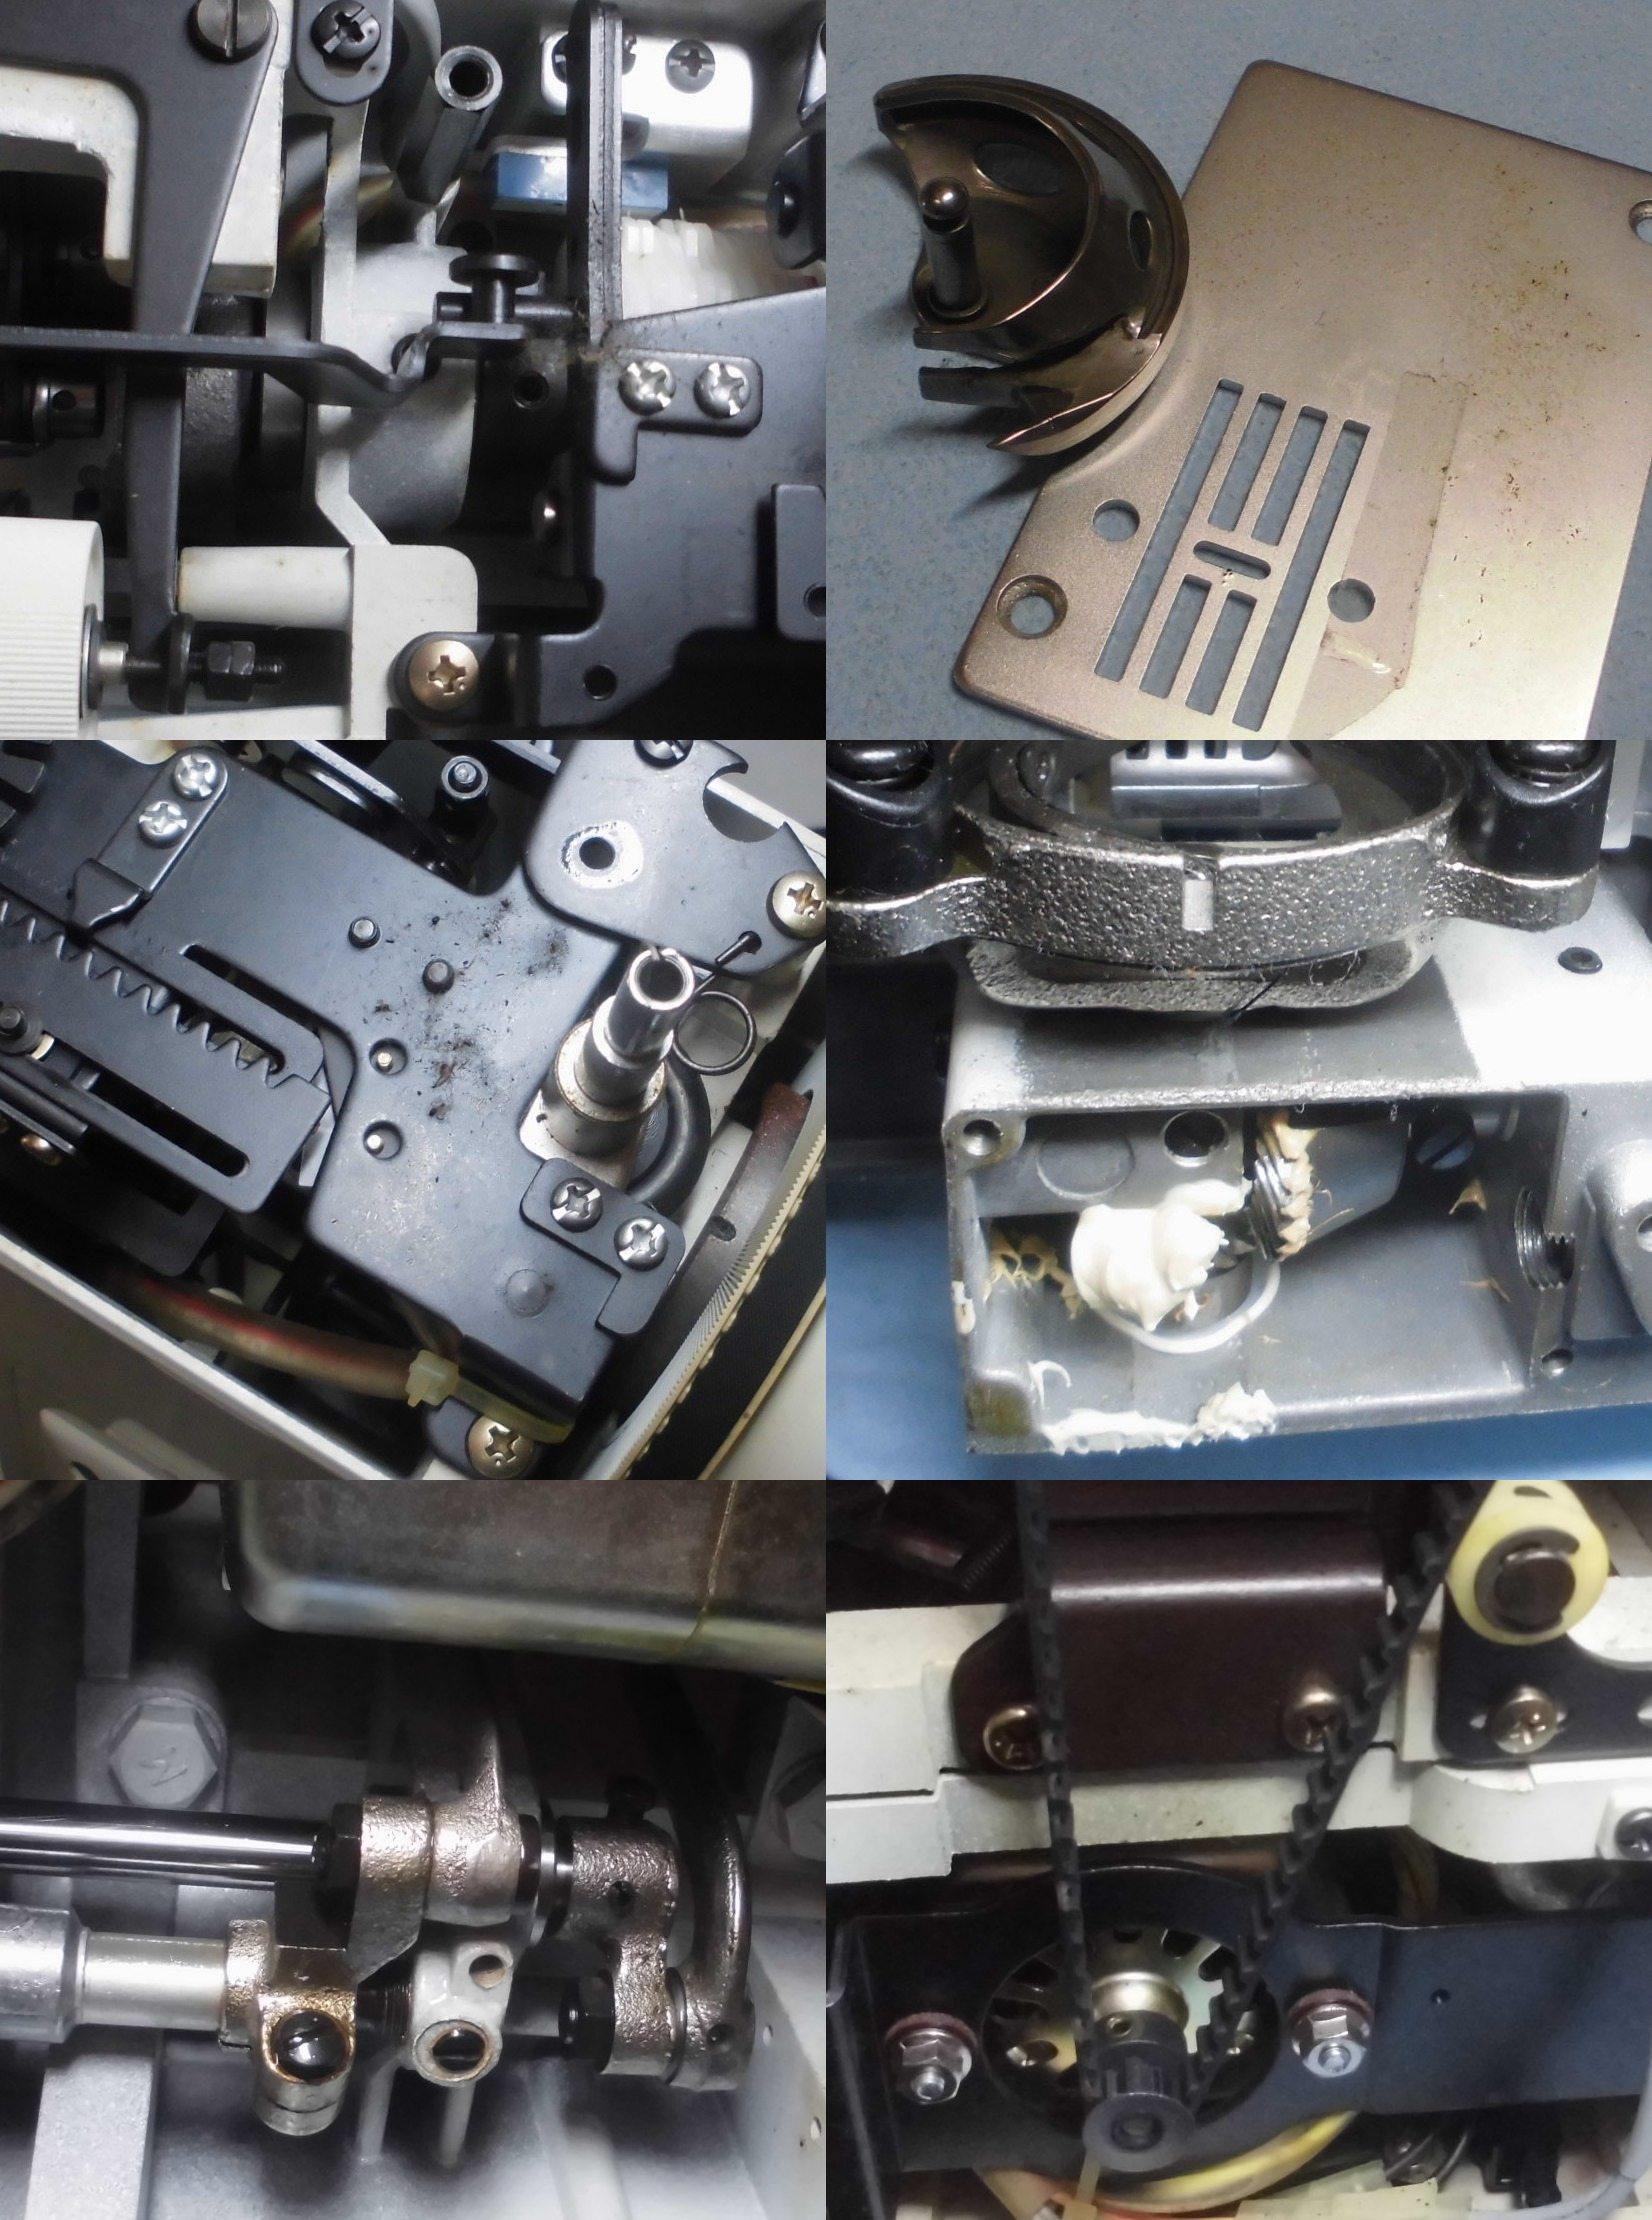 ELECTRON6000の全体オーバーホールメンテナンス修理|シンガーミシン